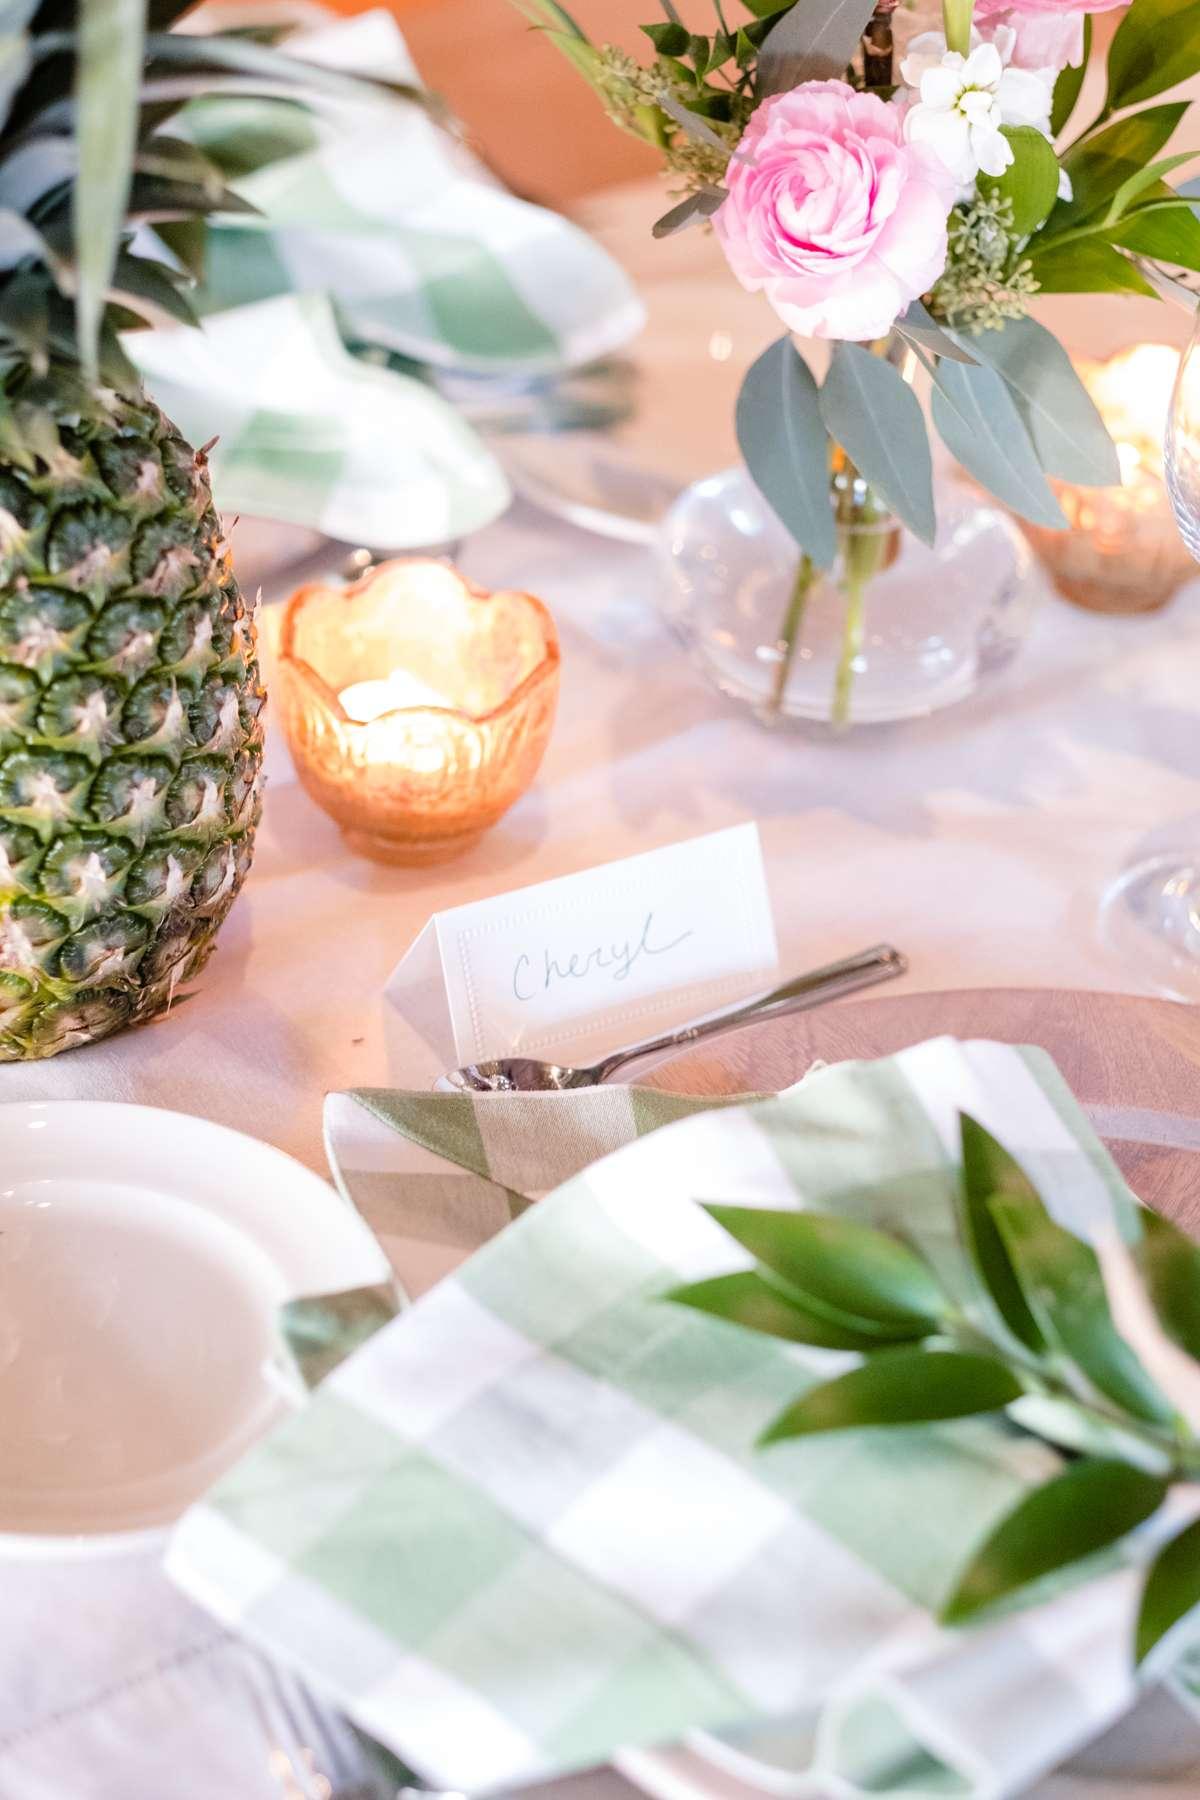 Jillian Attaway shares her Charleston bridal brunch at Cannon Green // Rhyme & Reason